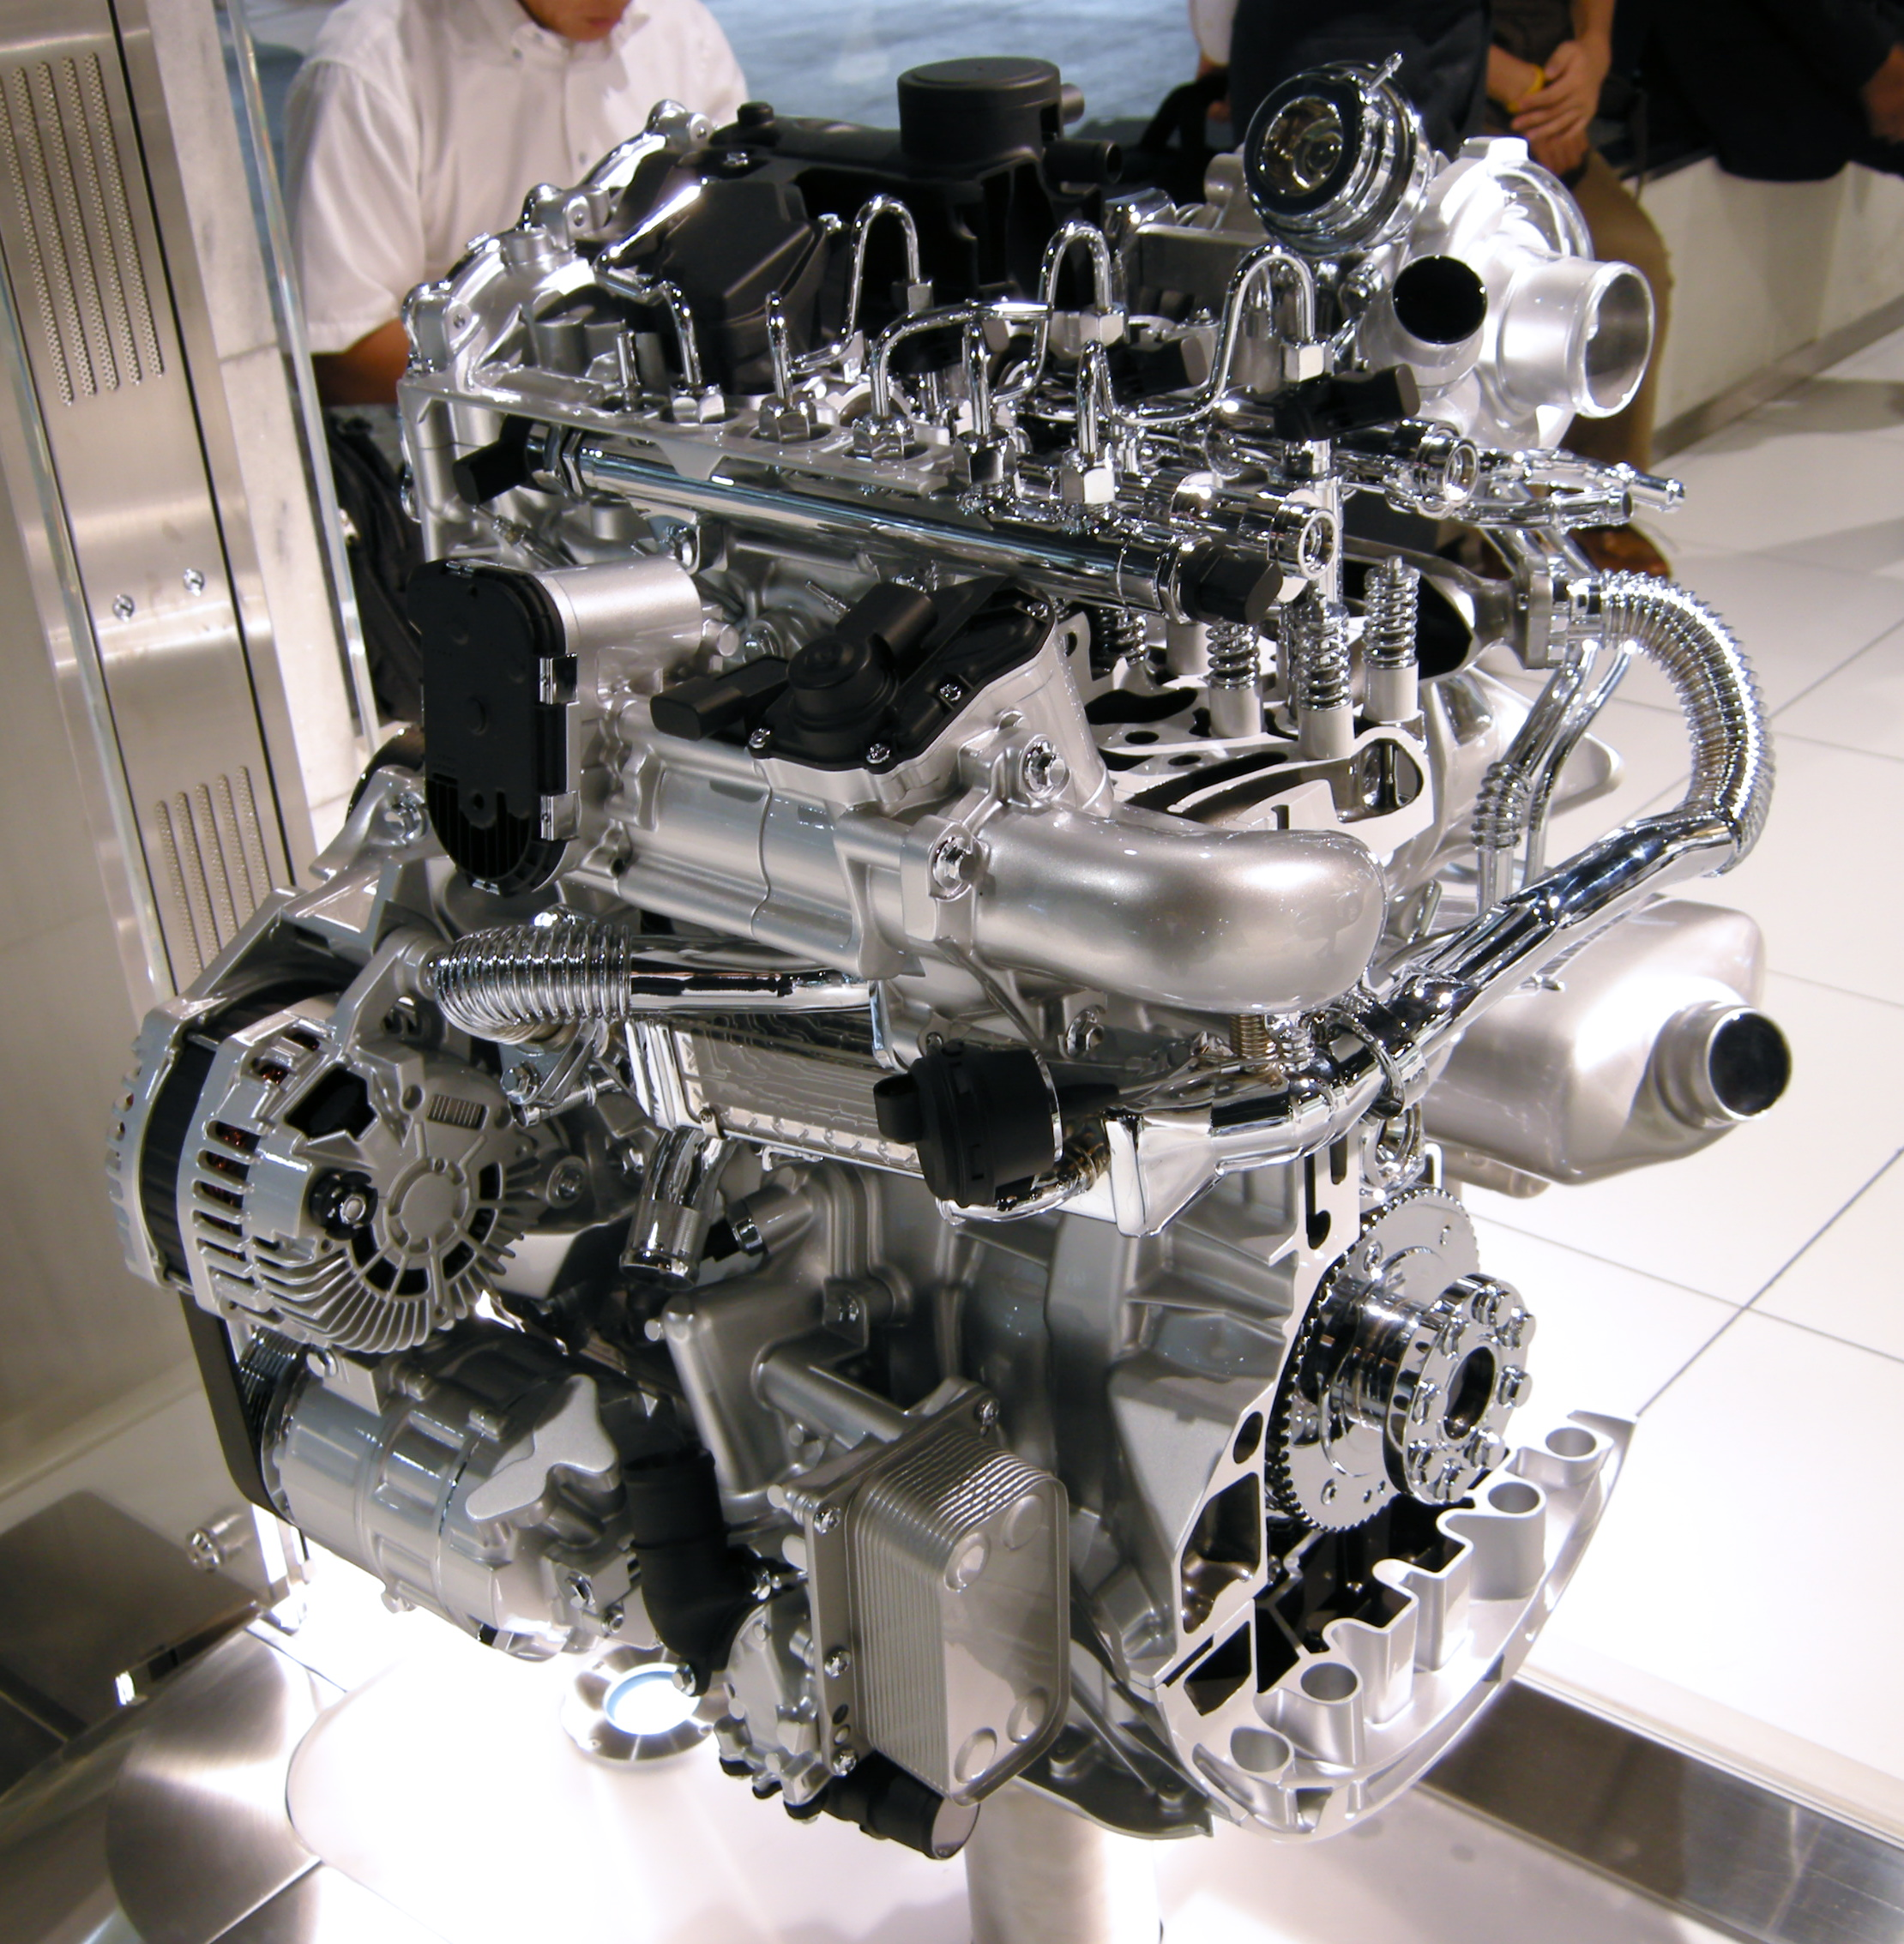 2 4 Liter Mitsubishi Engine Diagram 2000 Ford Focus Zts Fuse Box Diagram Bullet Squier Yenpancane Jeanjaures37 Fr